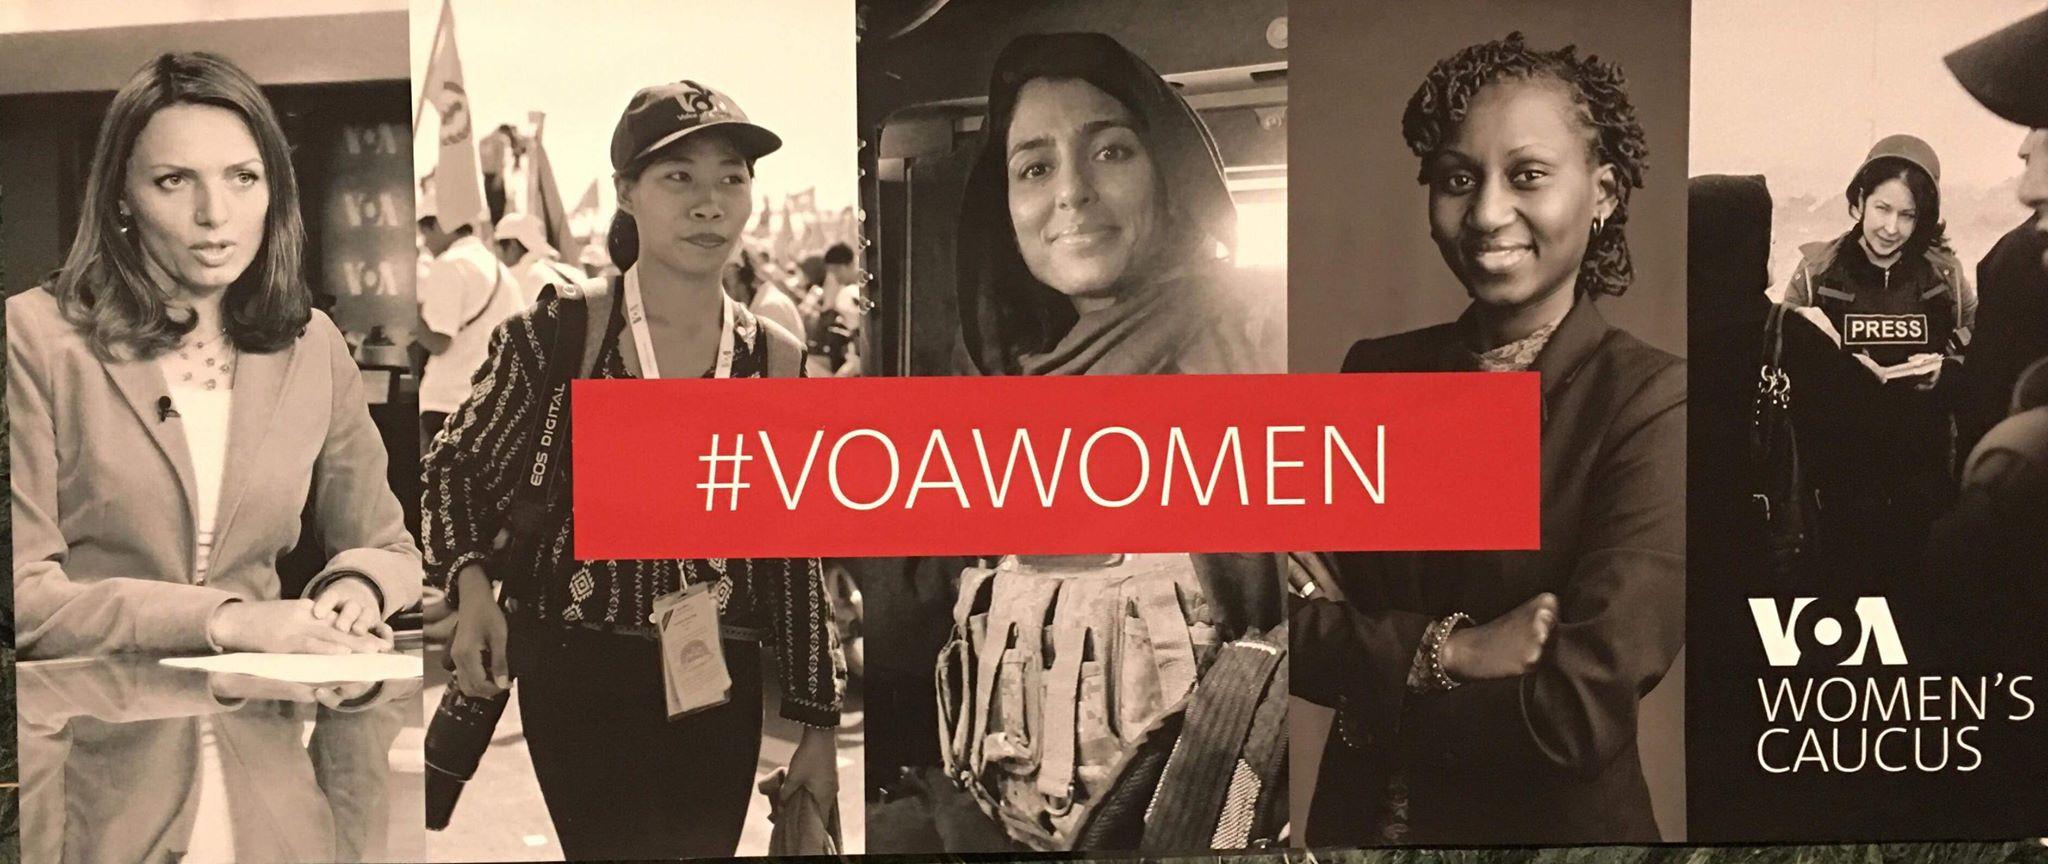 VOA women